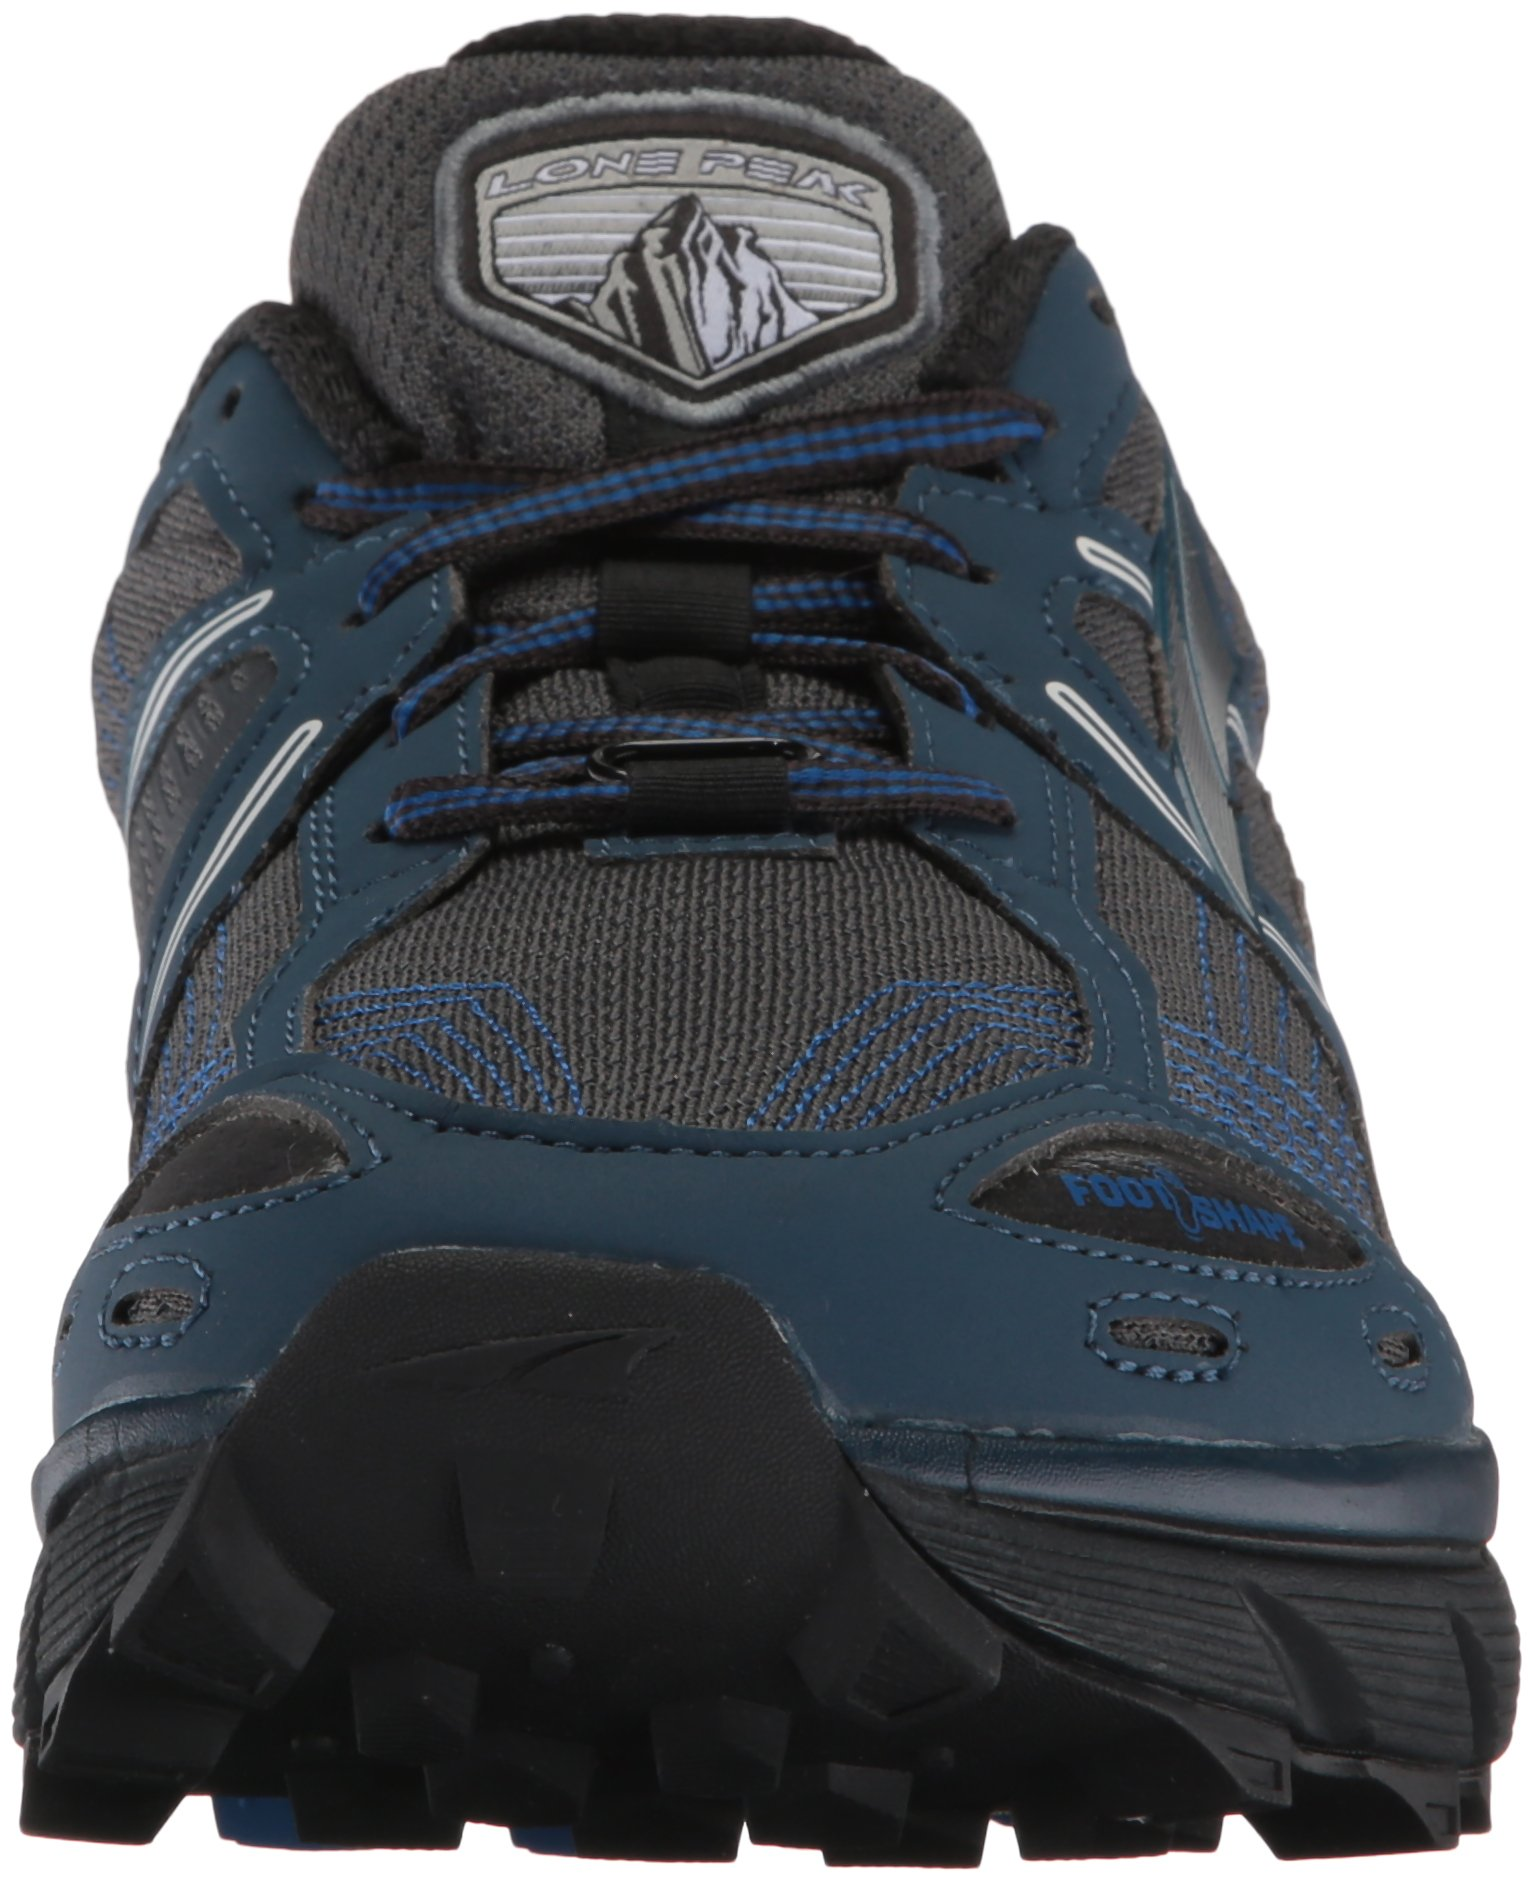 Altra Men's Lone Peak 3.5 Trail Running Shoe, Blue, 12 D US by Altra (Image #4)